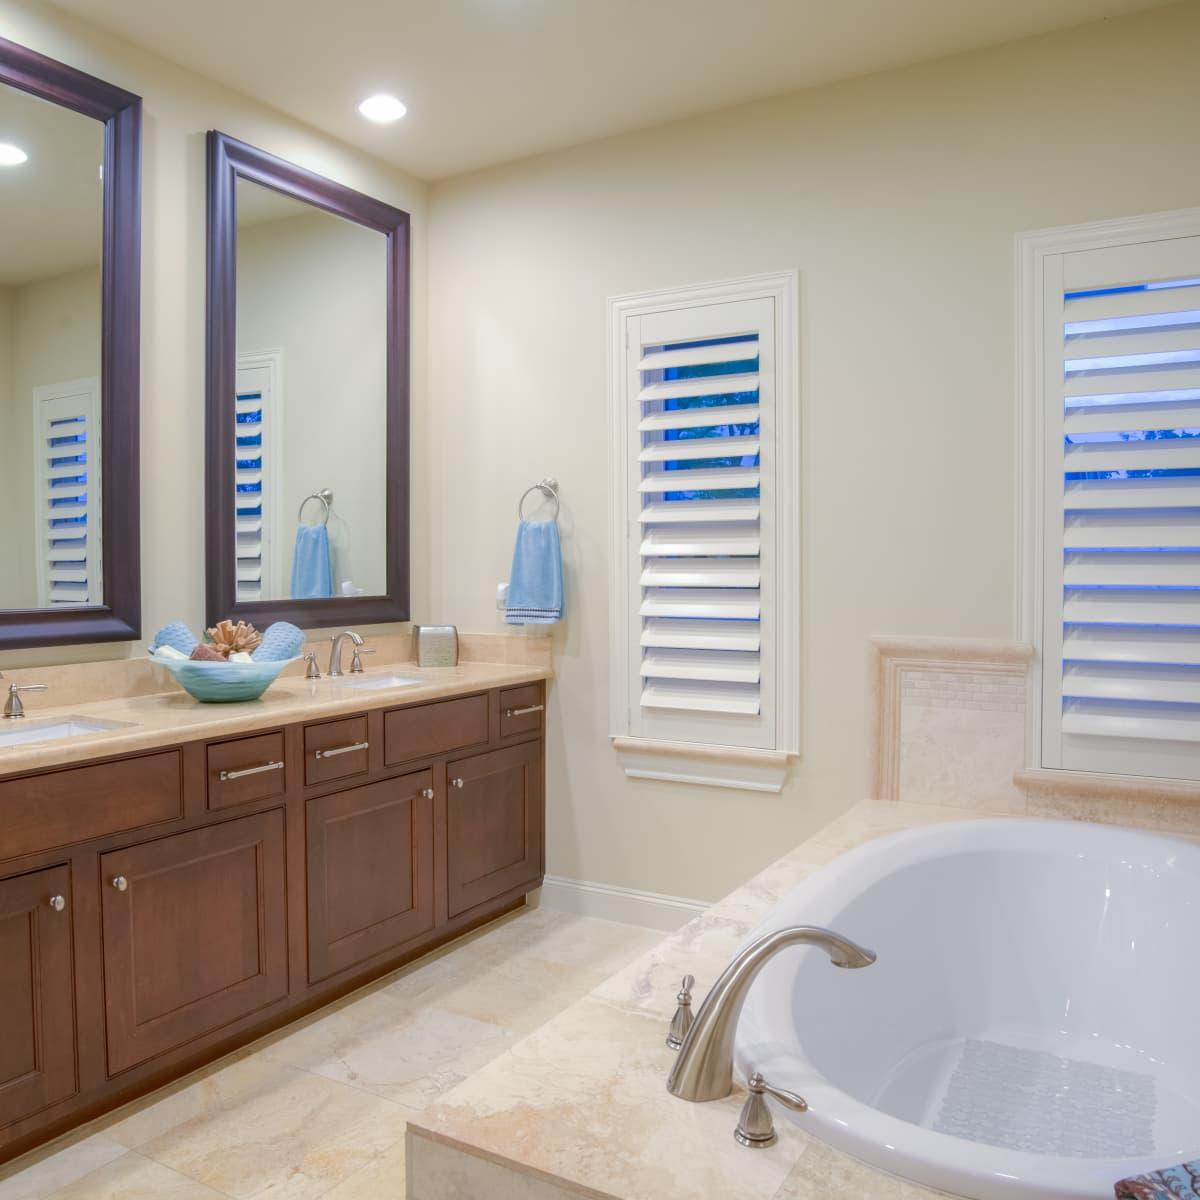 Houston, 1216 Bomar, June 2015, bath